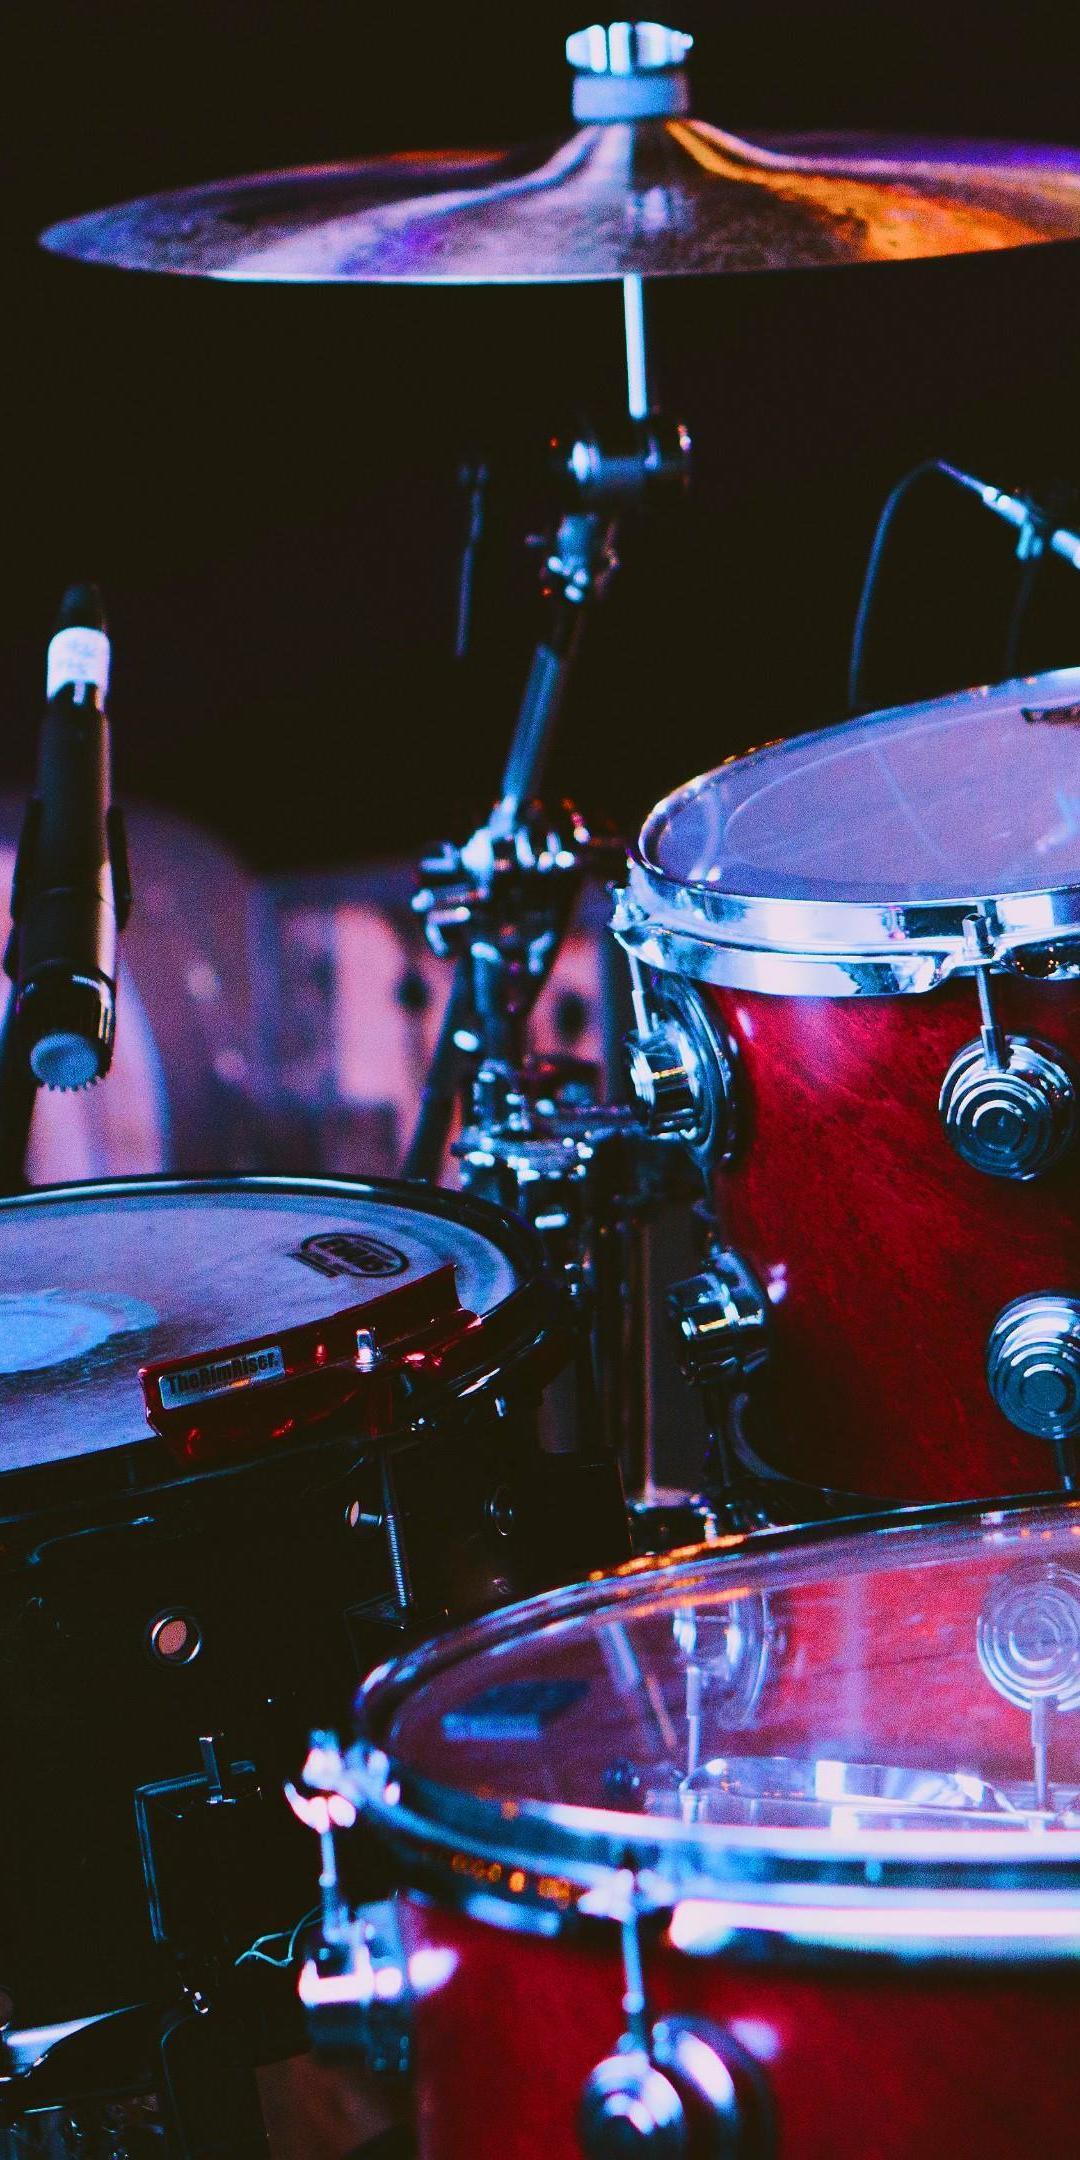 Drum Iphone 4 Wallpapers Top Free Drum Iphone 4